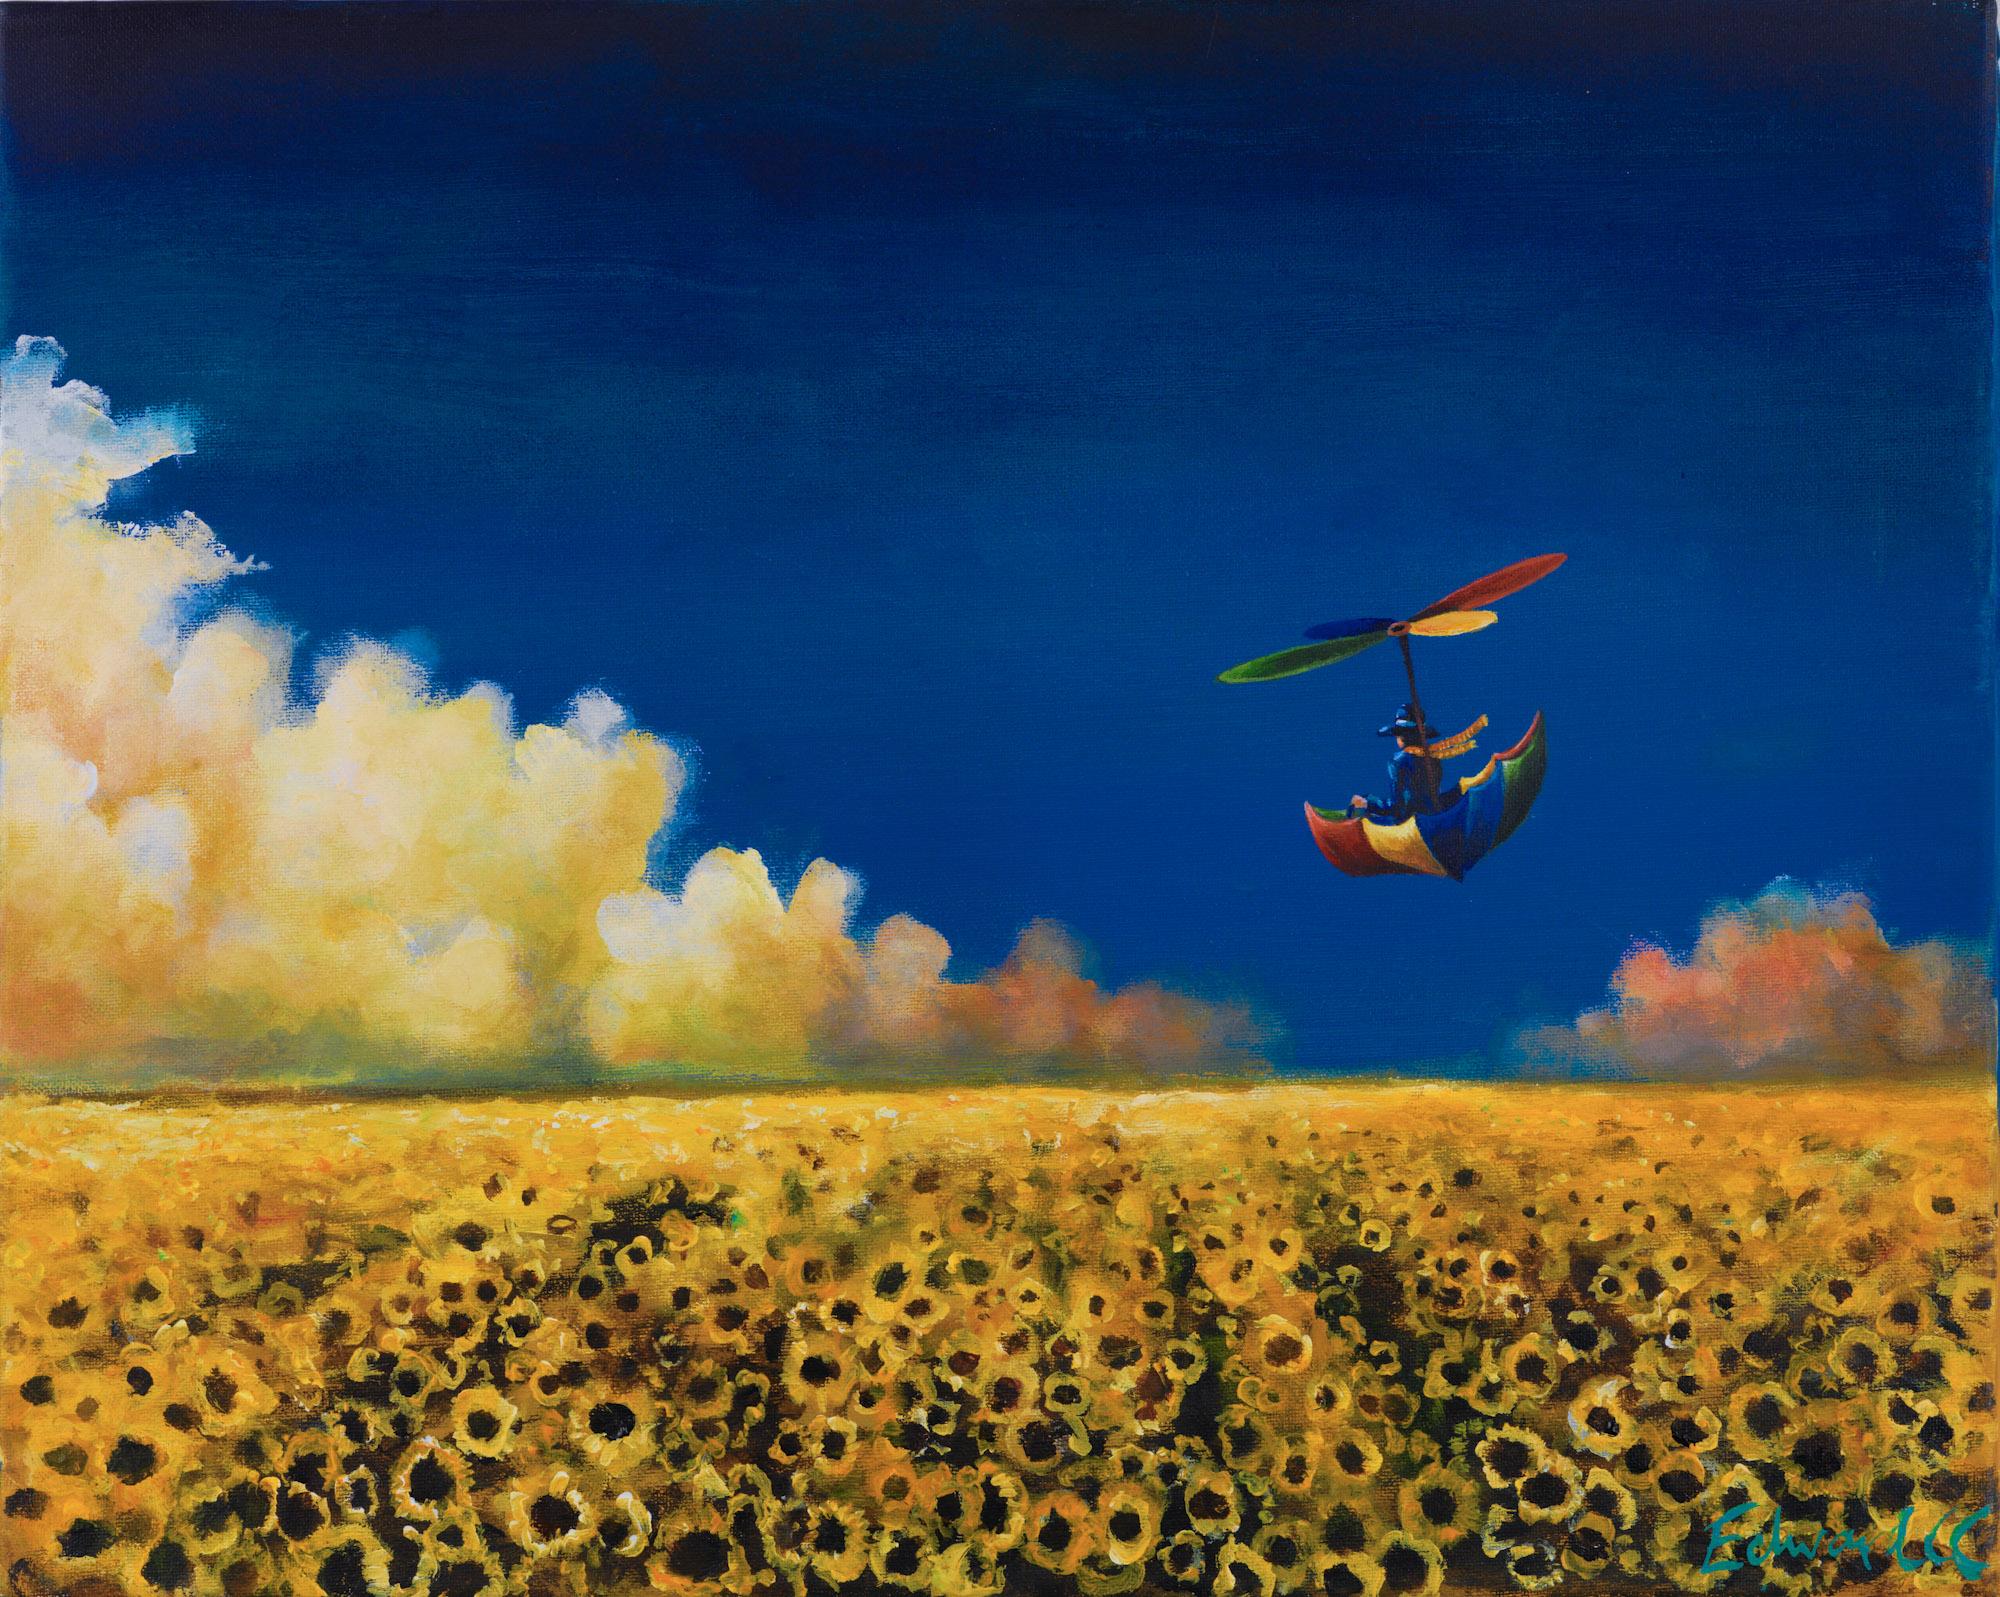 Sea of Sunflowers - Acrylic on Canvas 2011